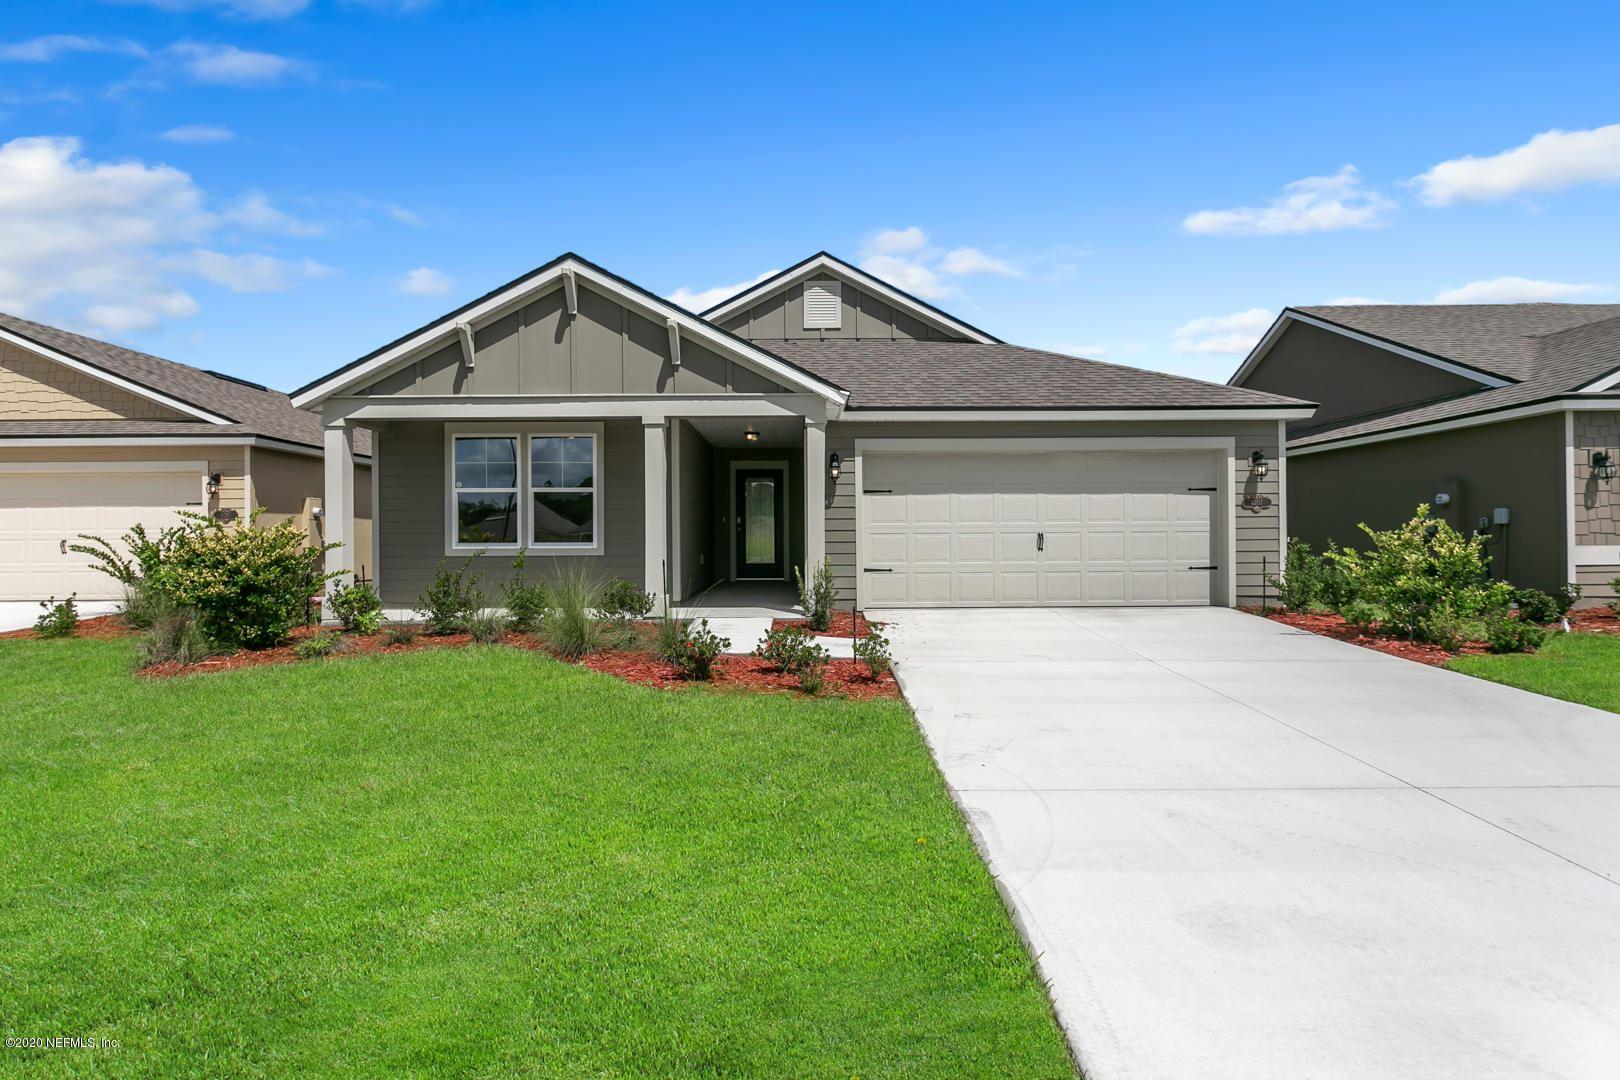 4301 GREEN RIVER PL #Lot No: 446, Middleburg, FL 32068 - MLS#: 1046299